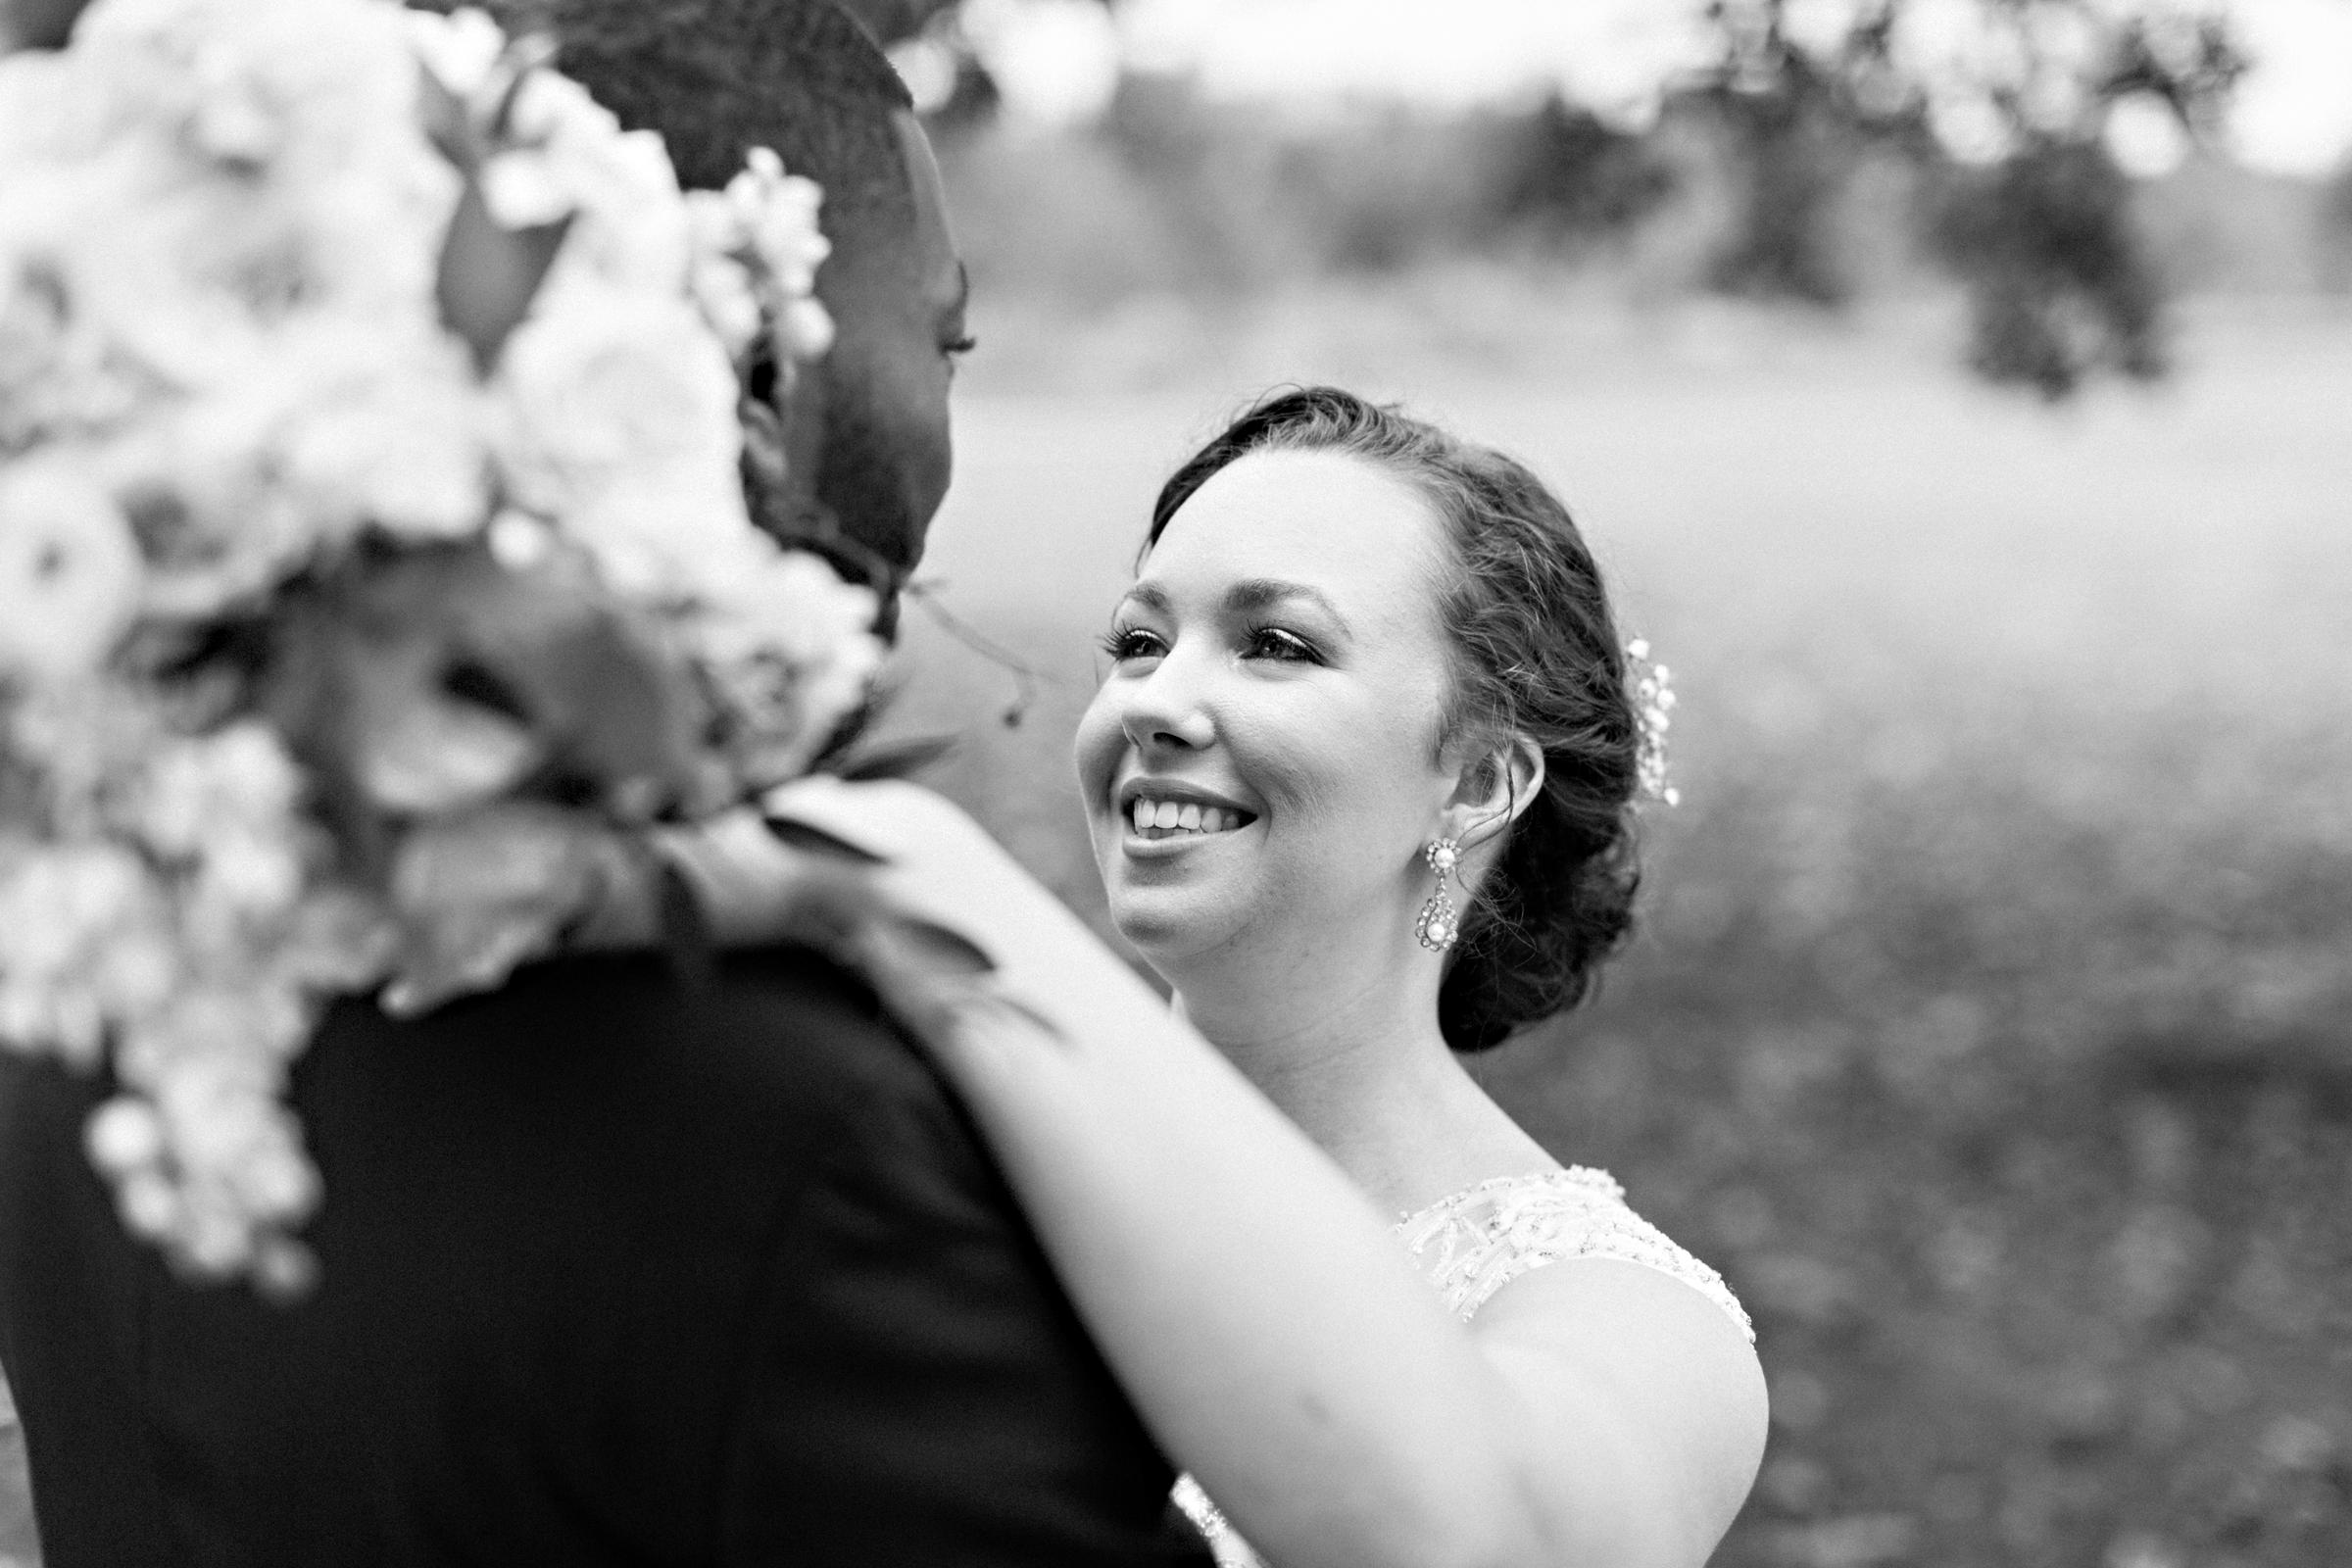 Alabama-Wedding-Photography-Nick-Drollette-Cory-Laura-127.jpg